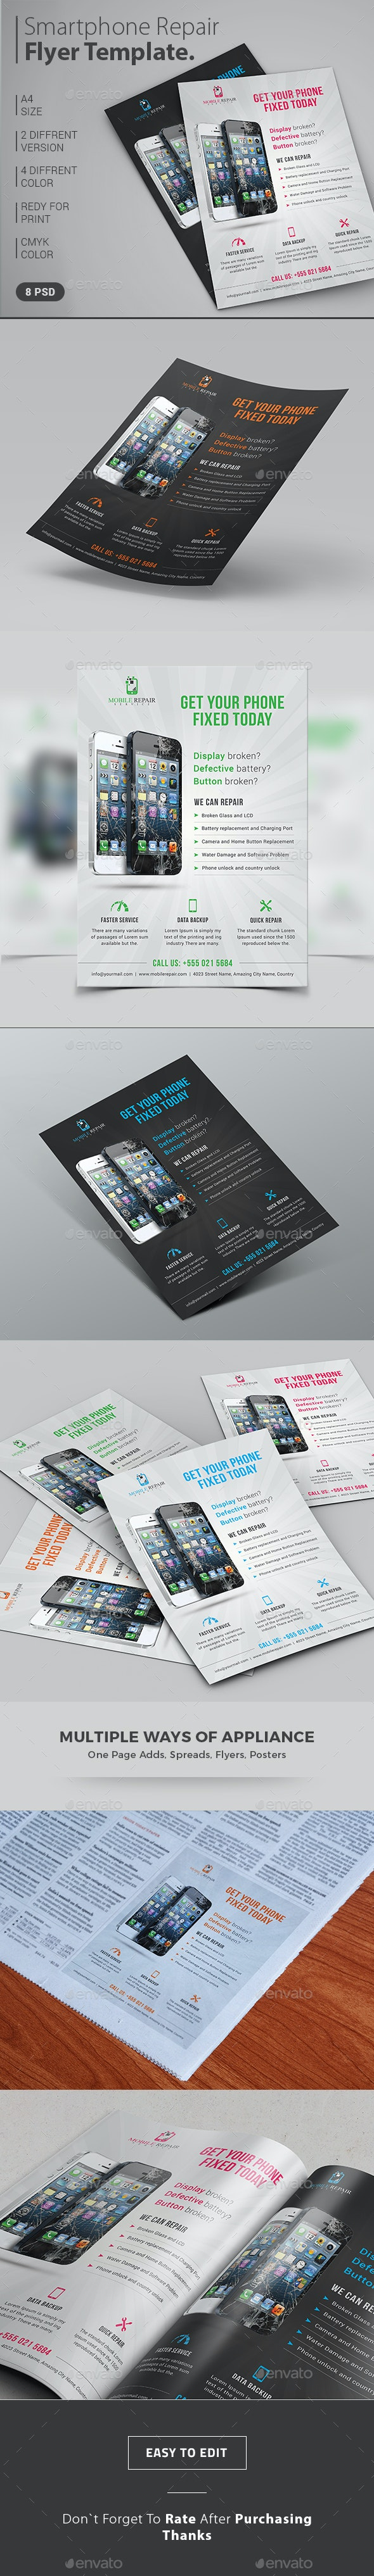 Smartphone Repair Service Flyer / Magazine Ad - Commerce Flyers